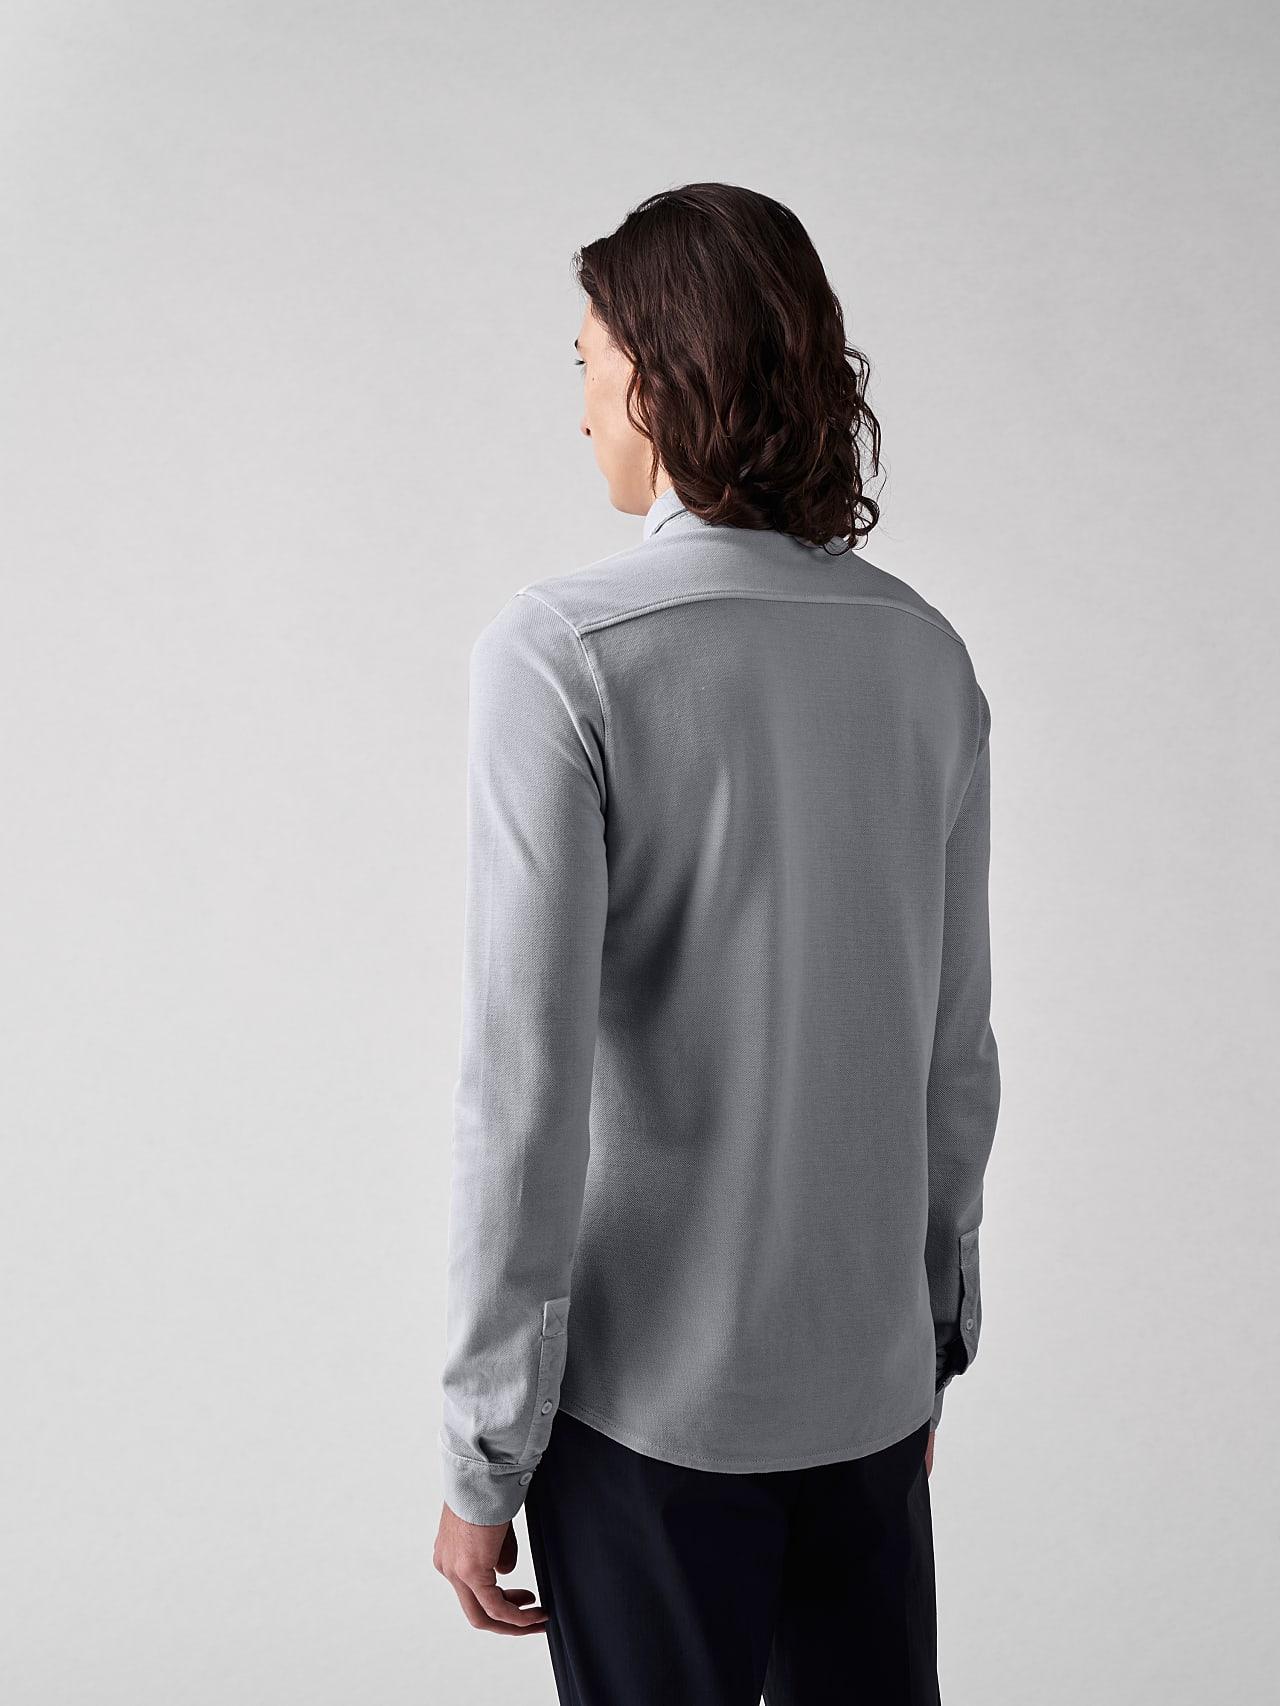 JIQUE V1.Y5.01 Pique Shirt with Kent Collar light grey Front Main Alpha Tauri